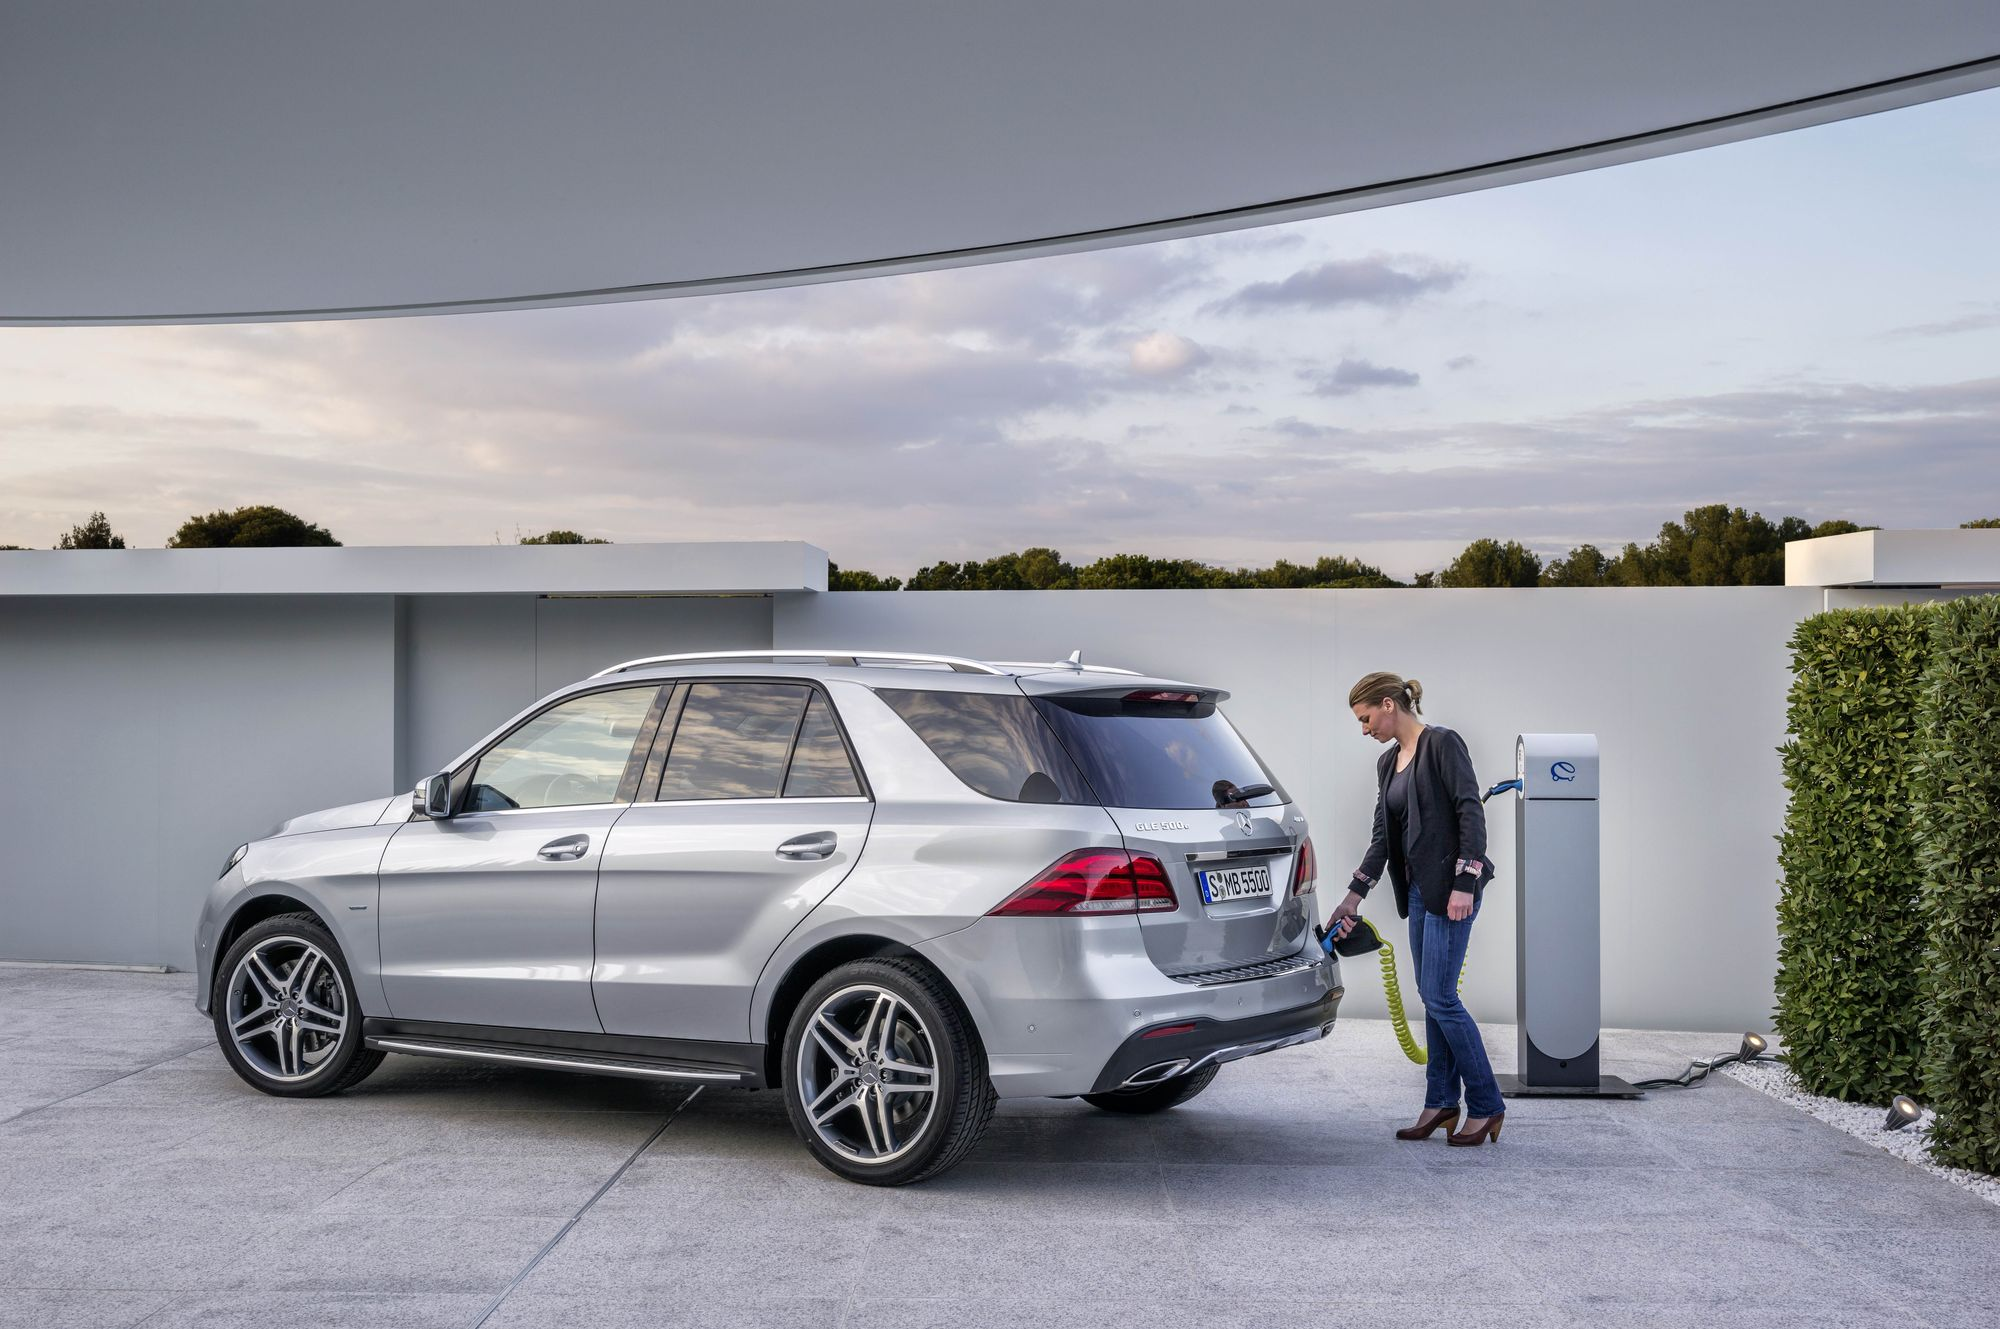 2018 Mercedes Benz Gle 550e 4matic Plug In Hybrid A Safe Sumptuous